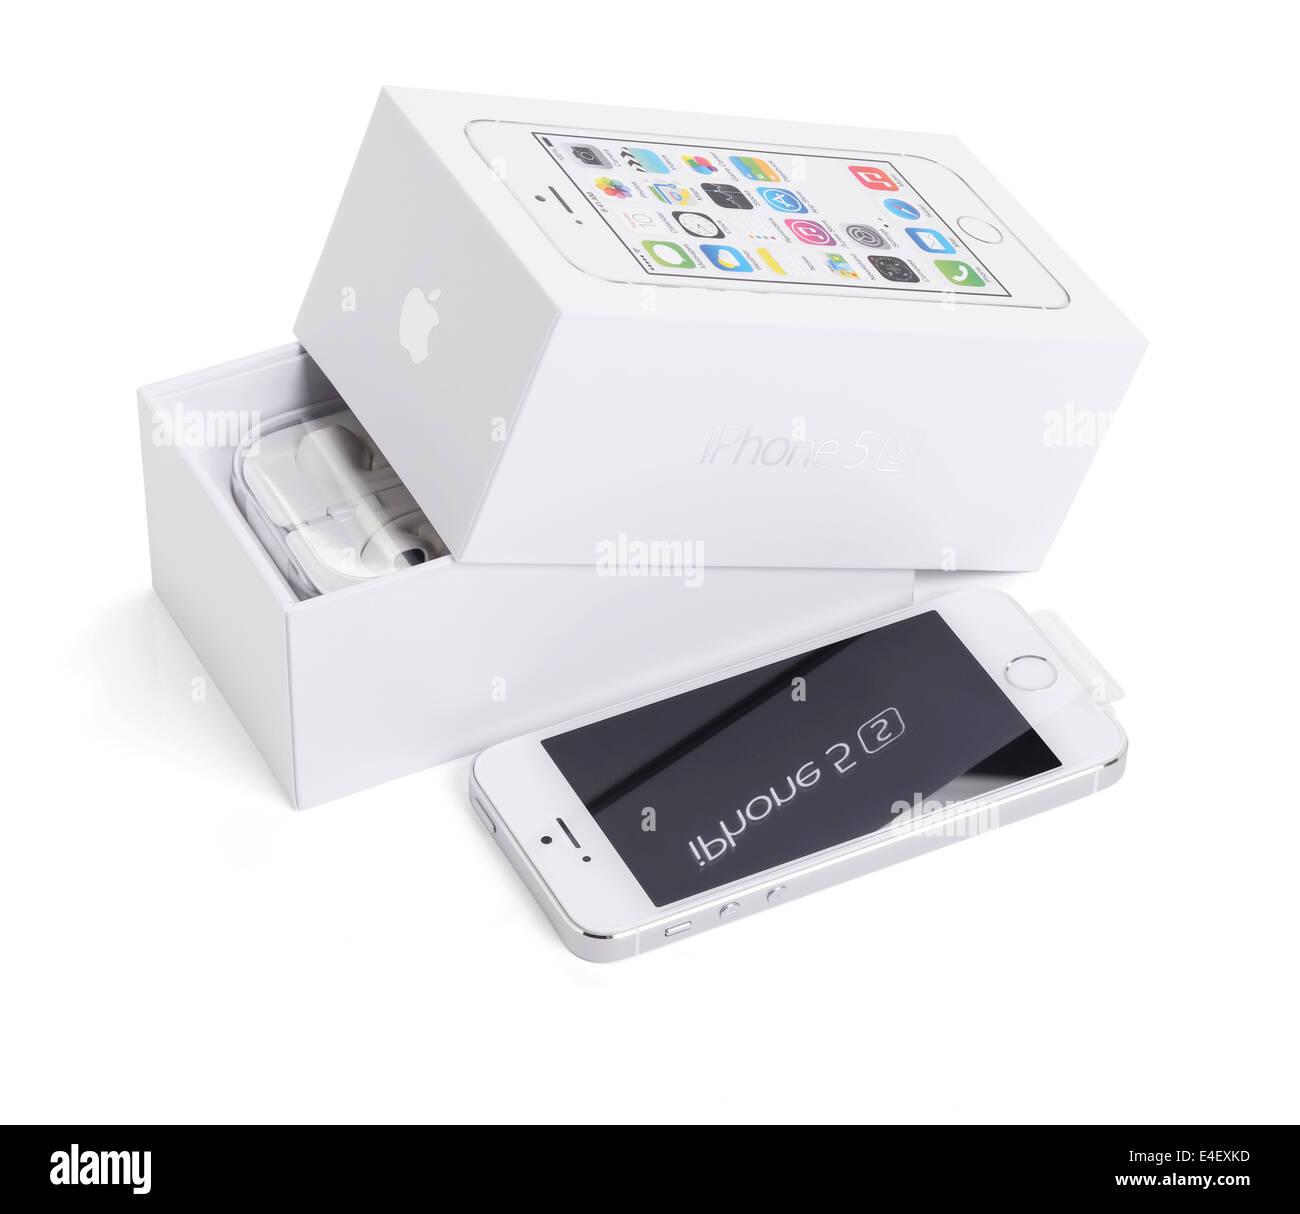 Un Apple iPhone 5s avec l'emballage d'origine Photo Stock